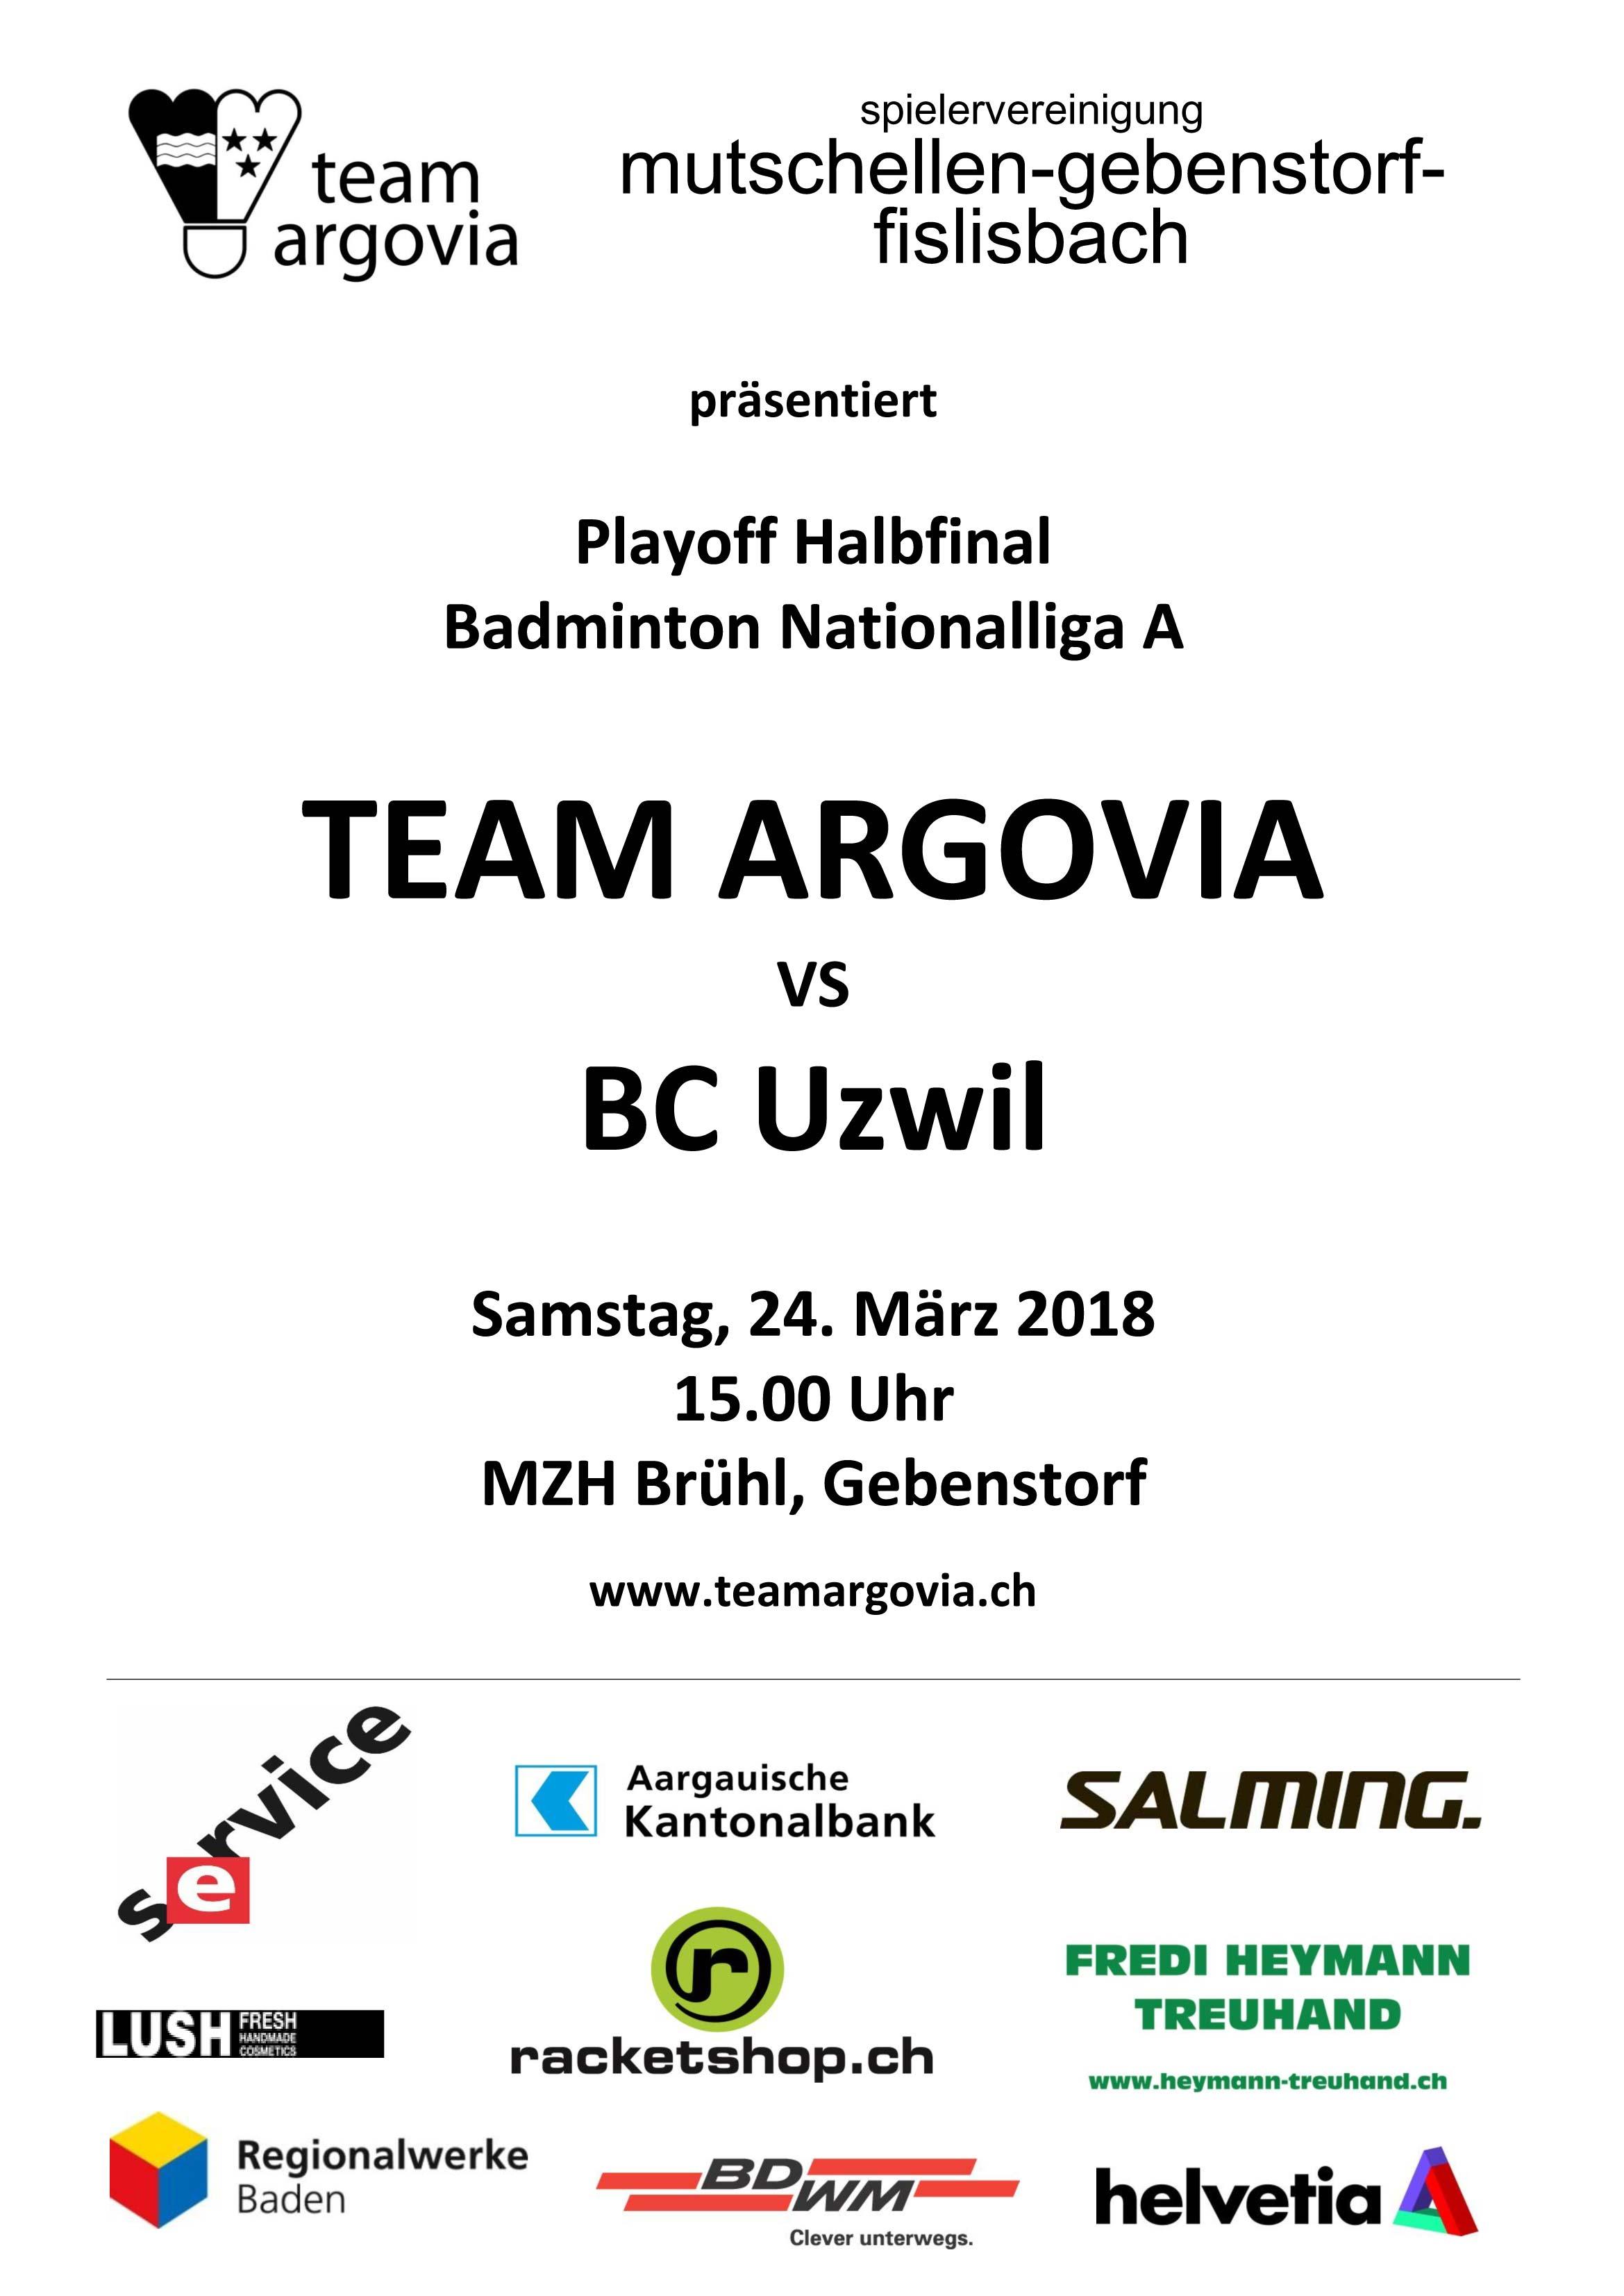 Plakat-Halb-Playoff-Uzwil